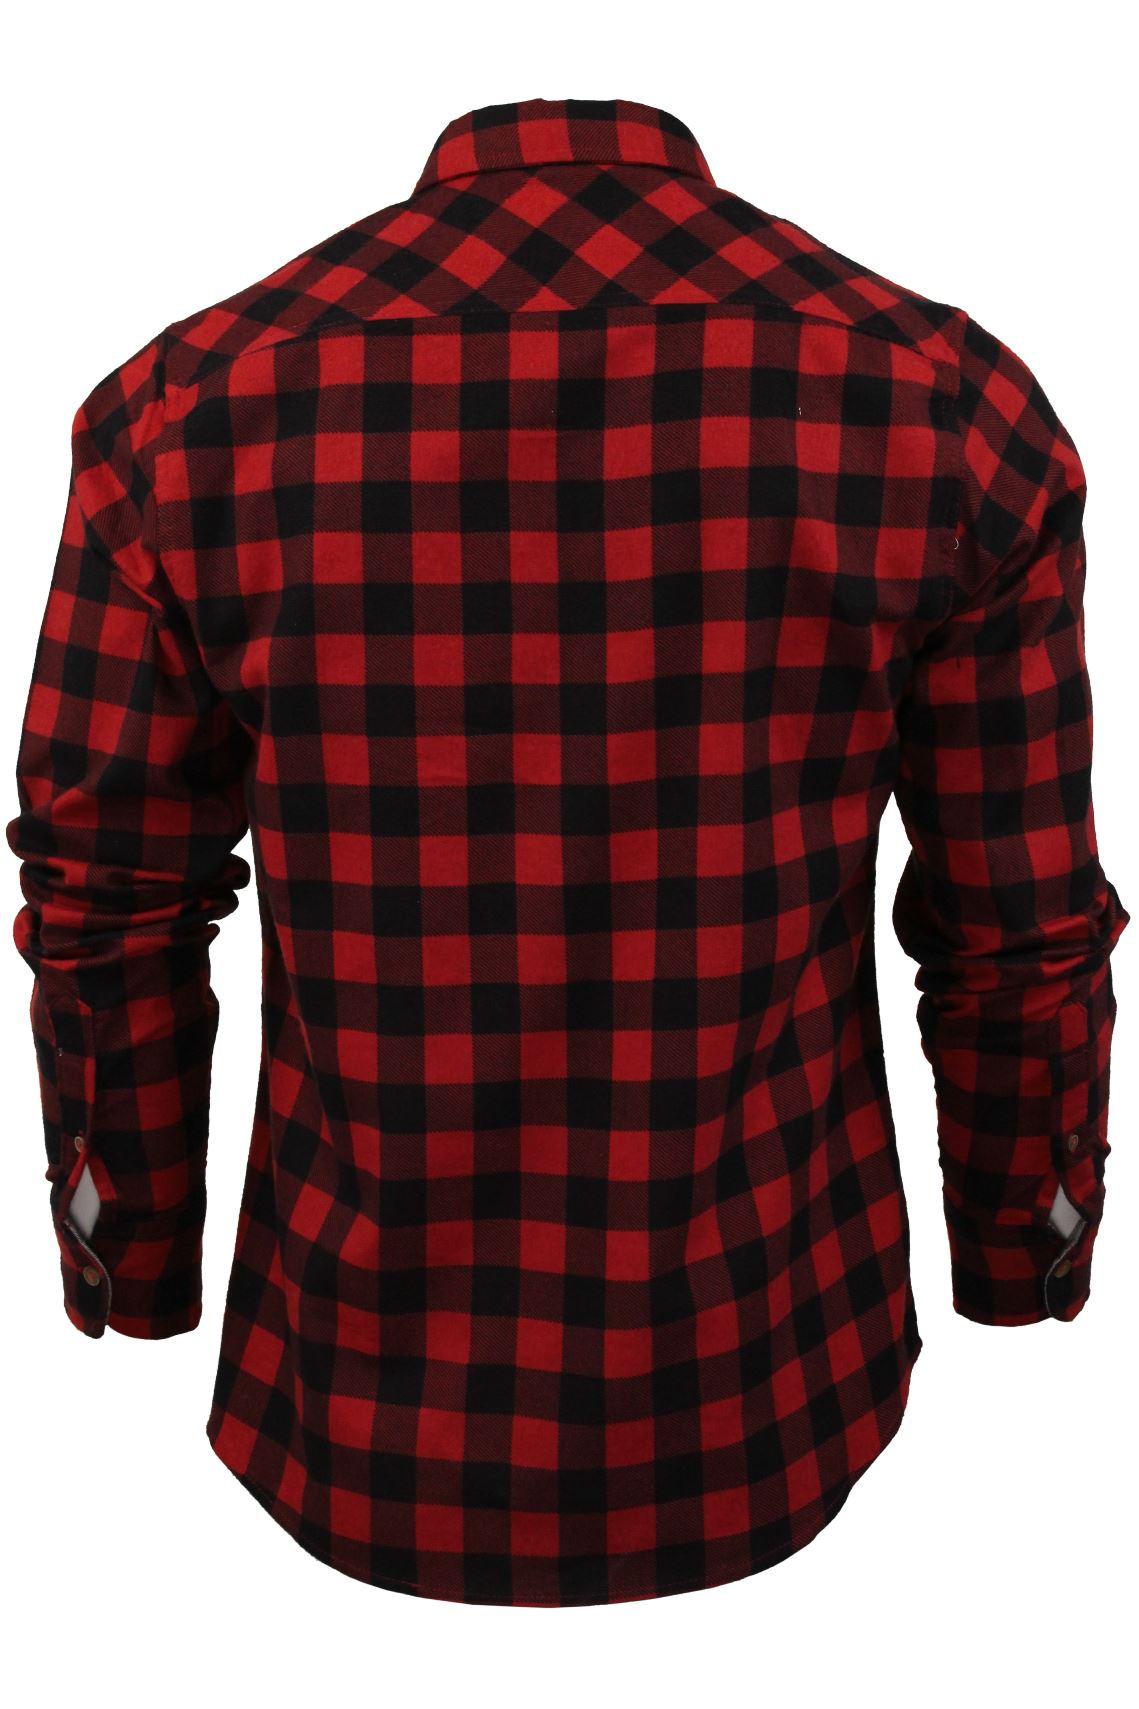 Brave-Soul-Brushed-Flannel-Check-Cotton-Jack-Shirt-Long-Sleeved thumbnail 9